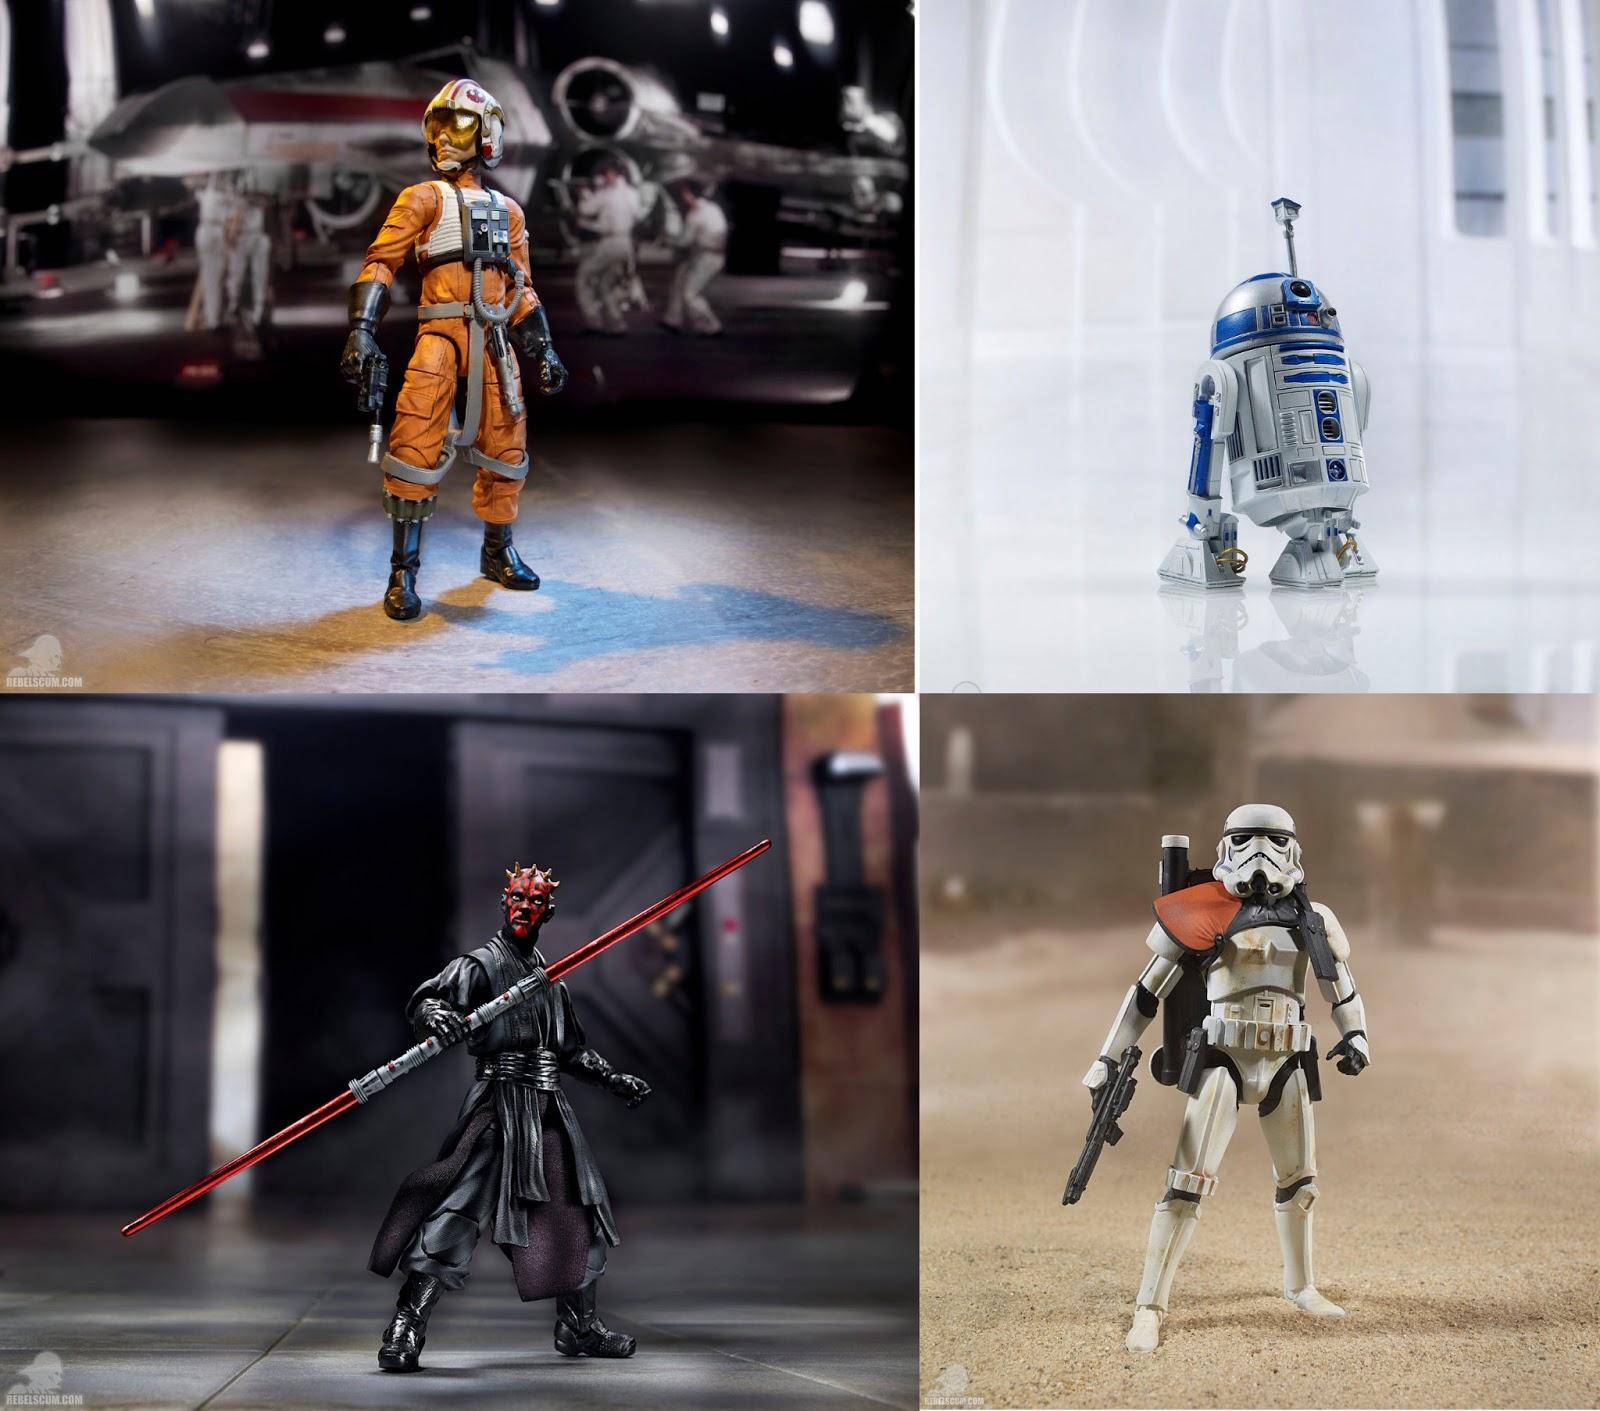 2013 Hasbro ® star wars ® mission série double pack 3,75 pouces personnages